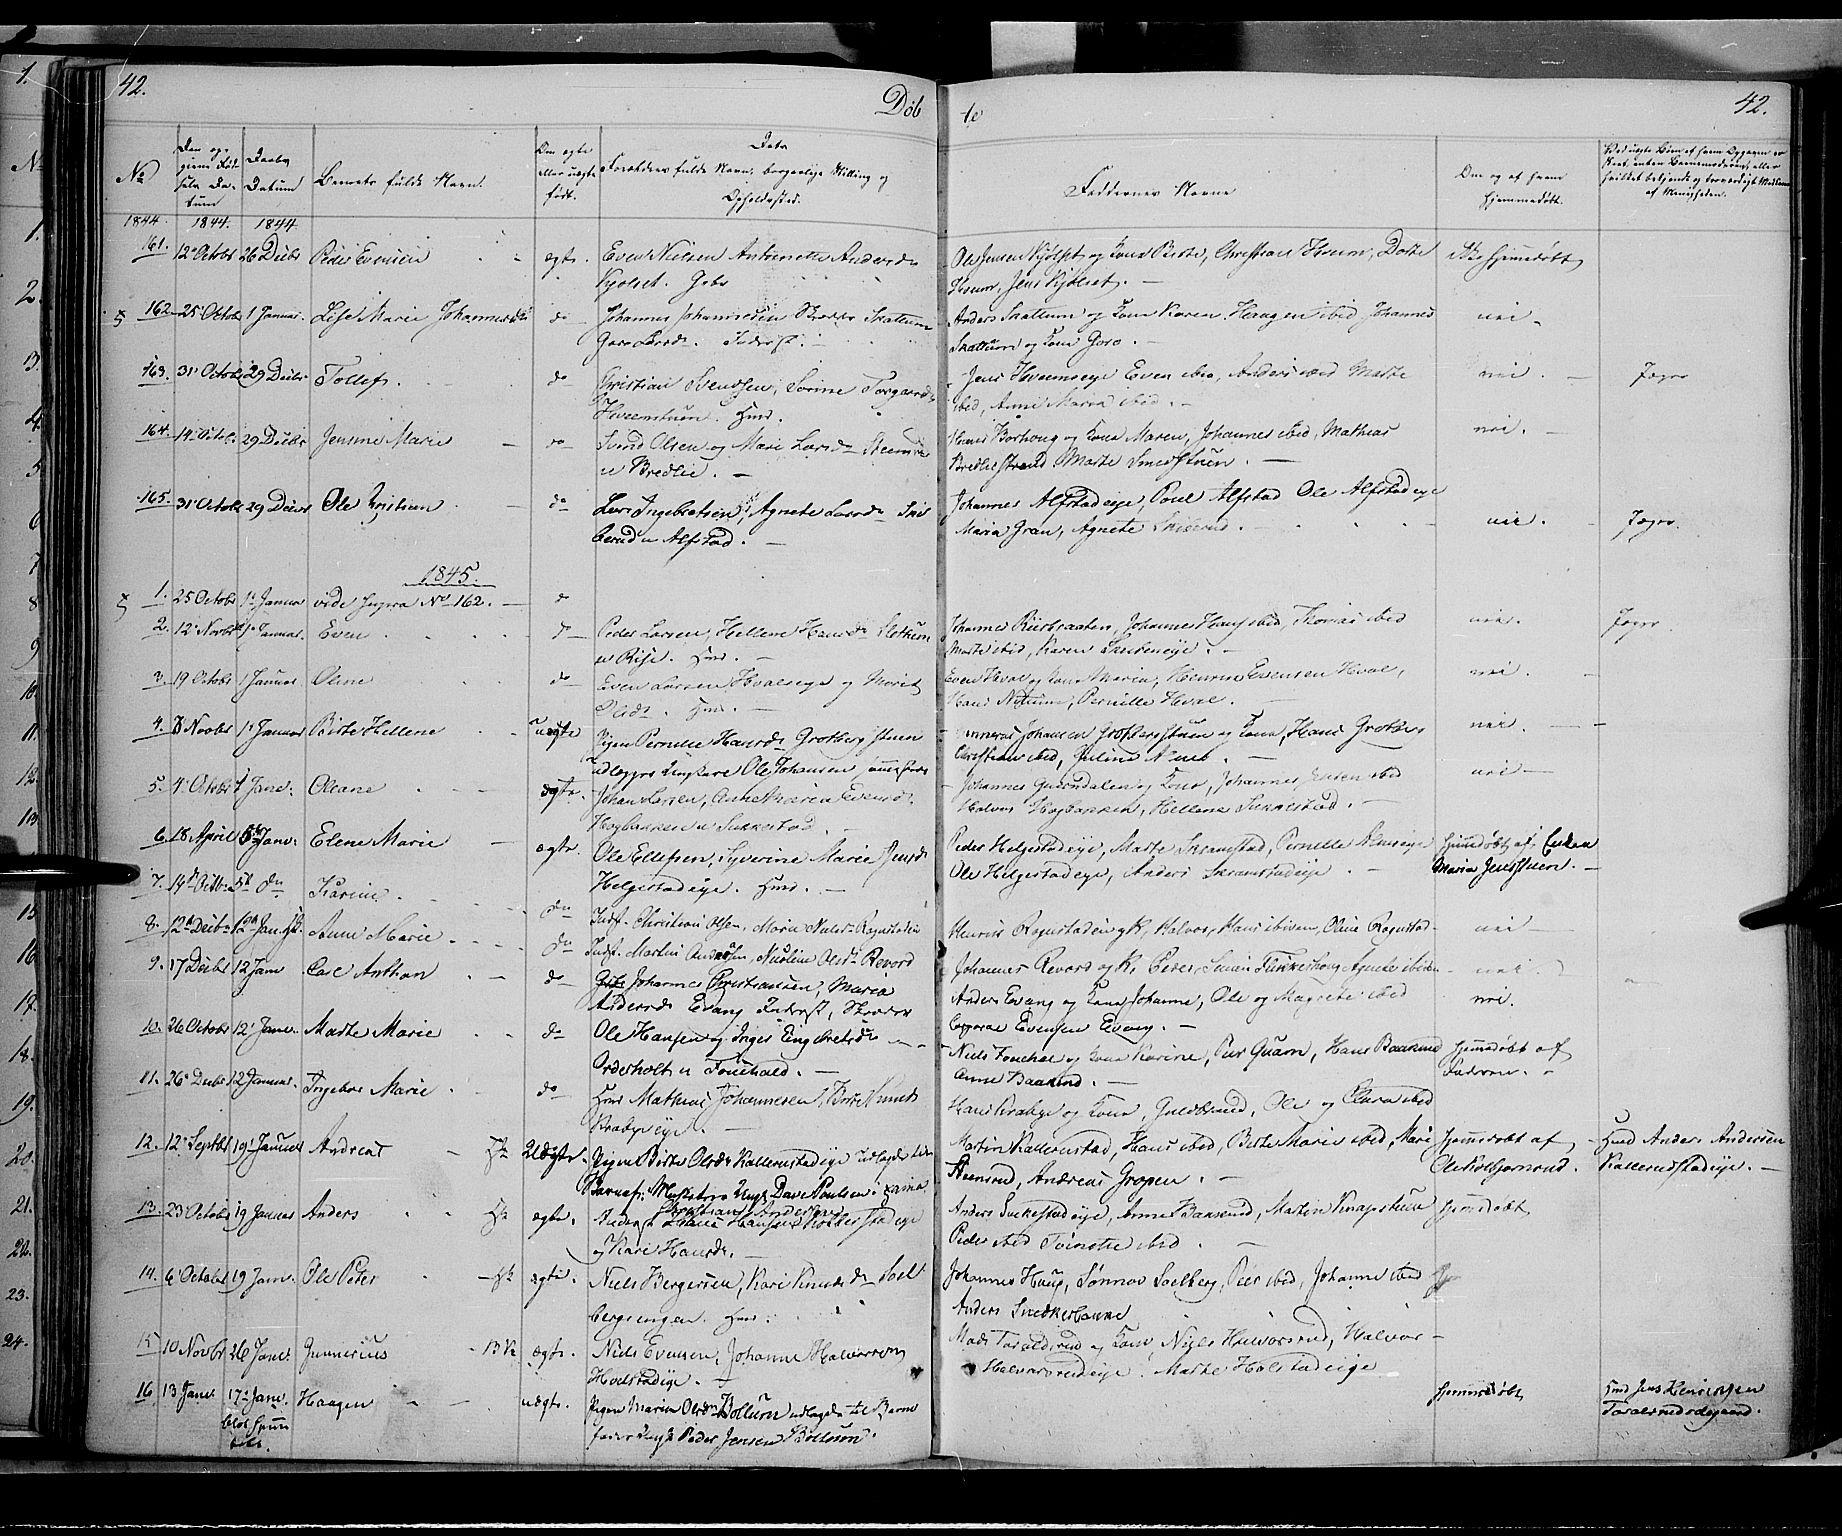 SAH, Østre Toten prestekontor, Ministerialbok nr. 2, 1840-1847, s. 42